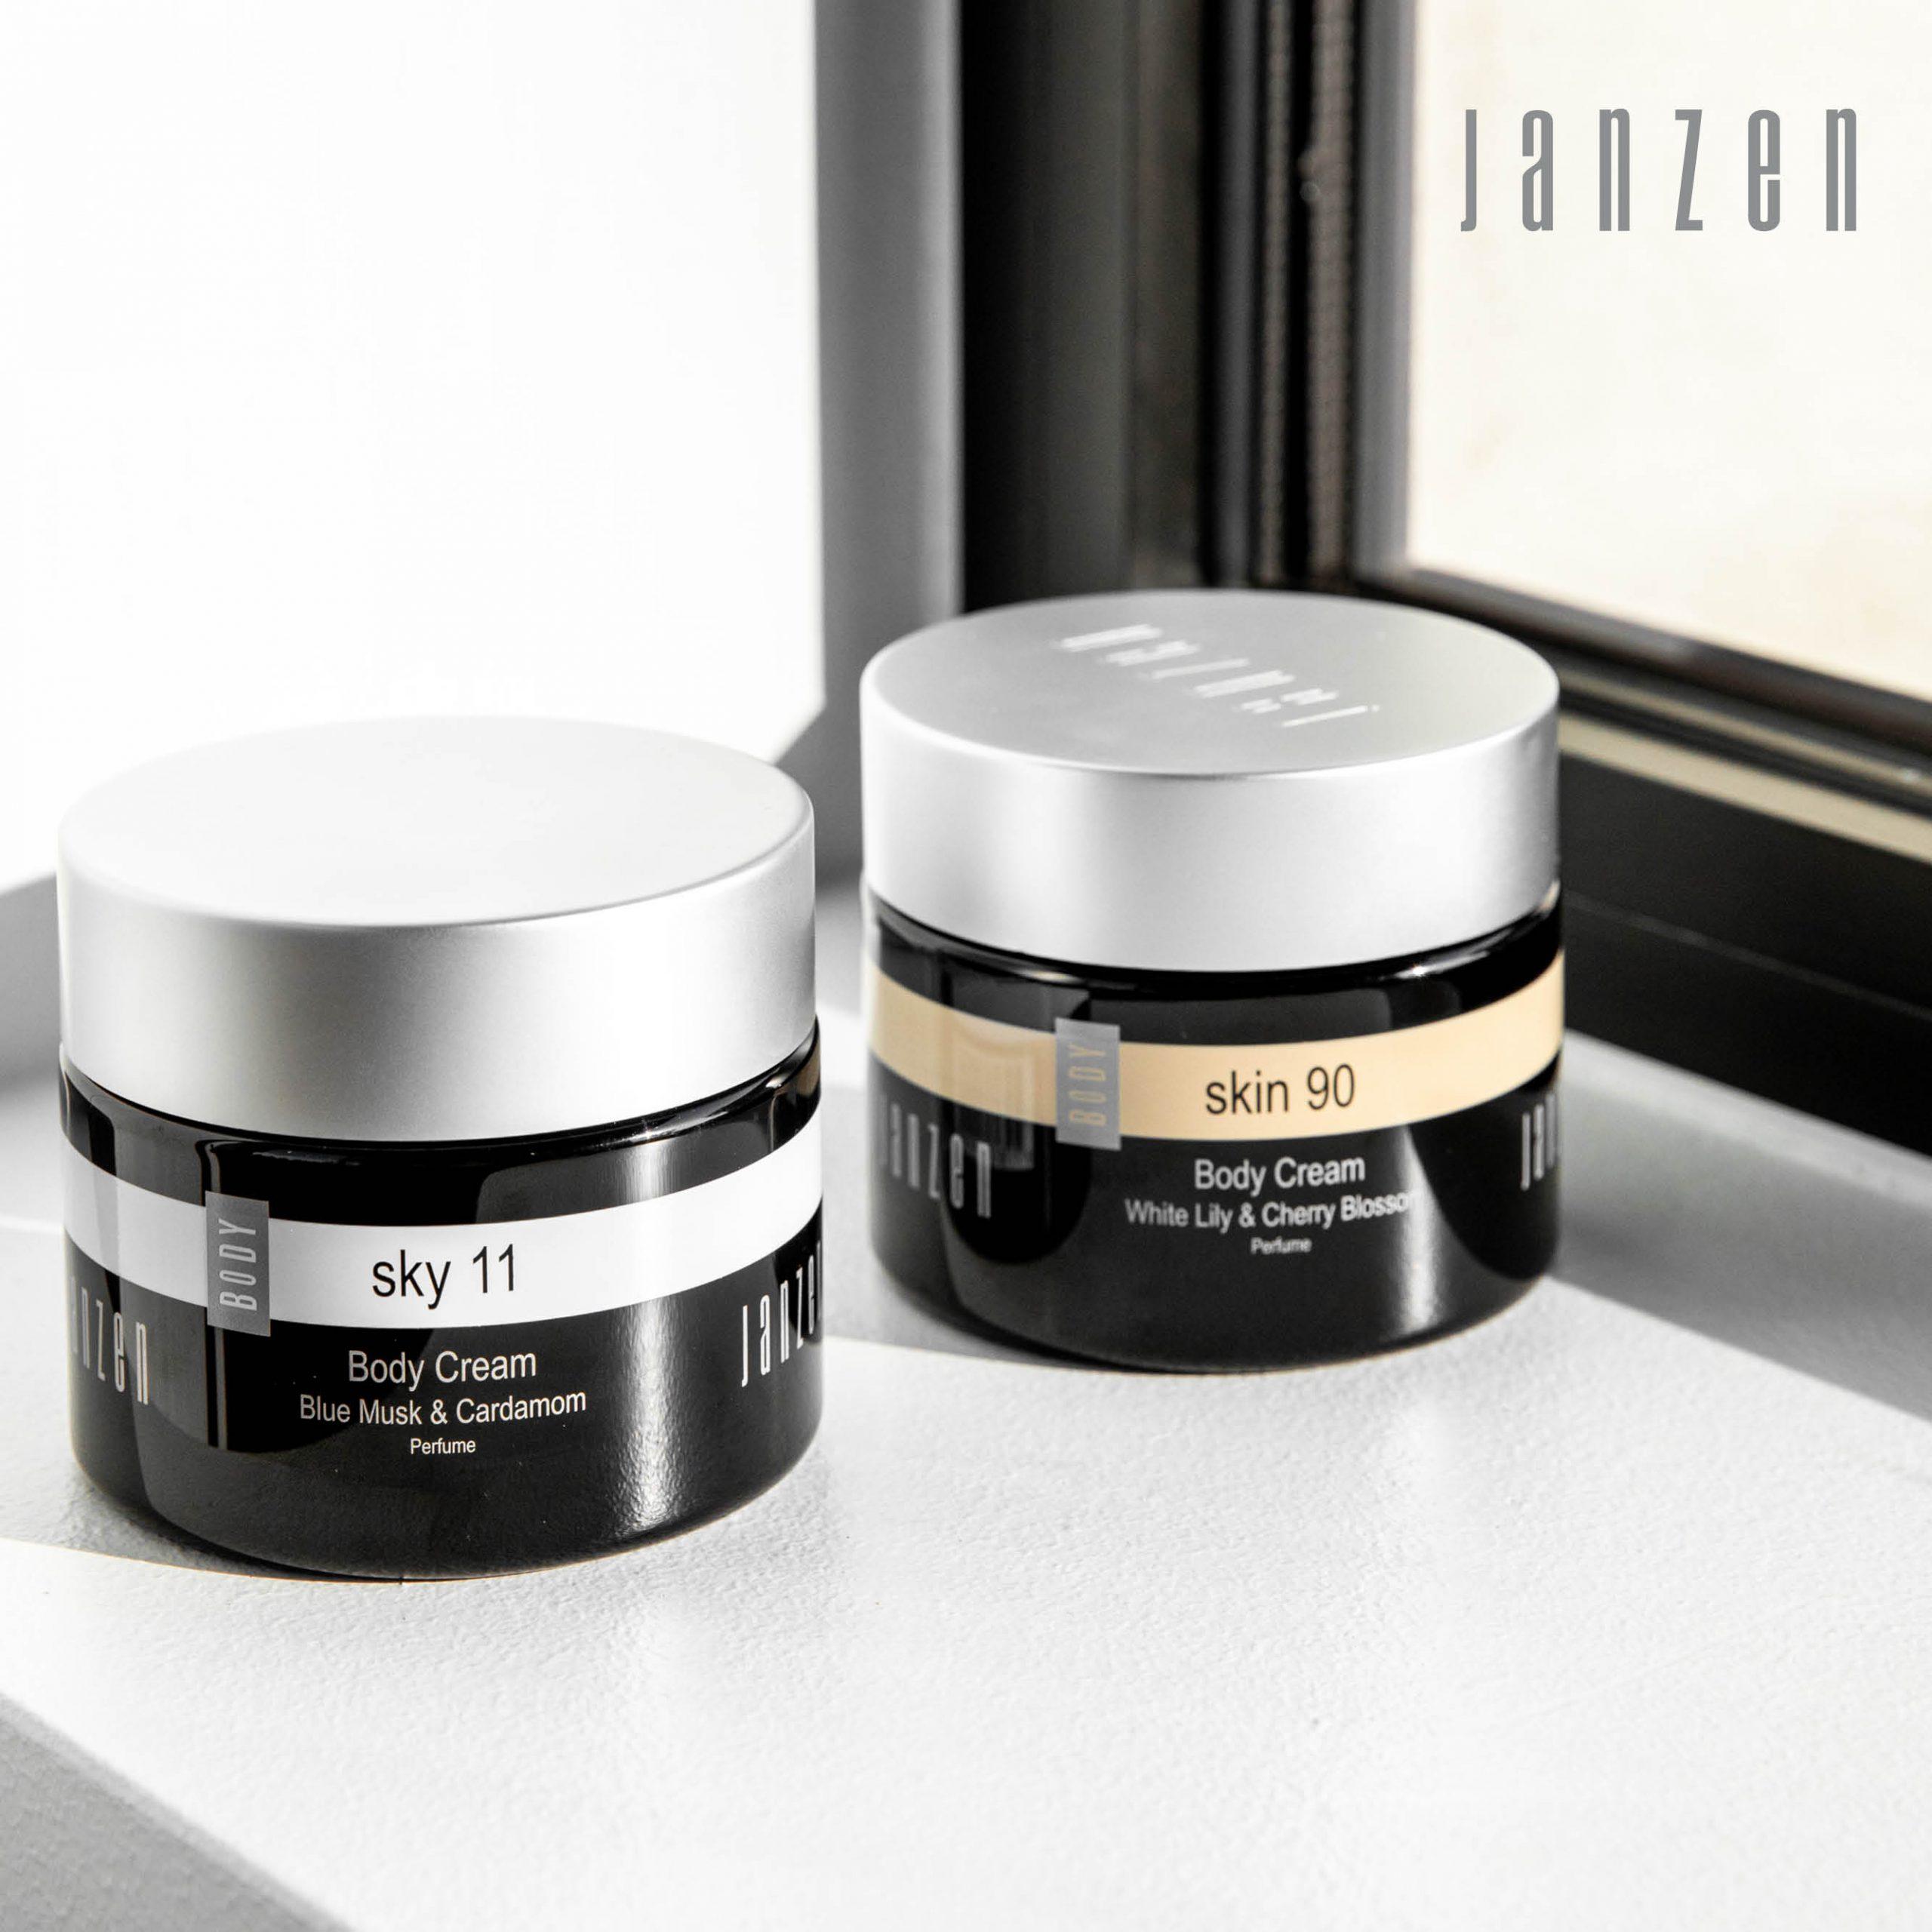 Body Cream & Body Lotion